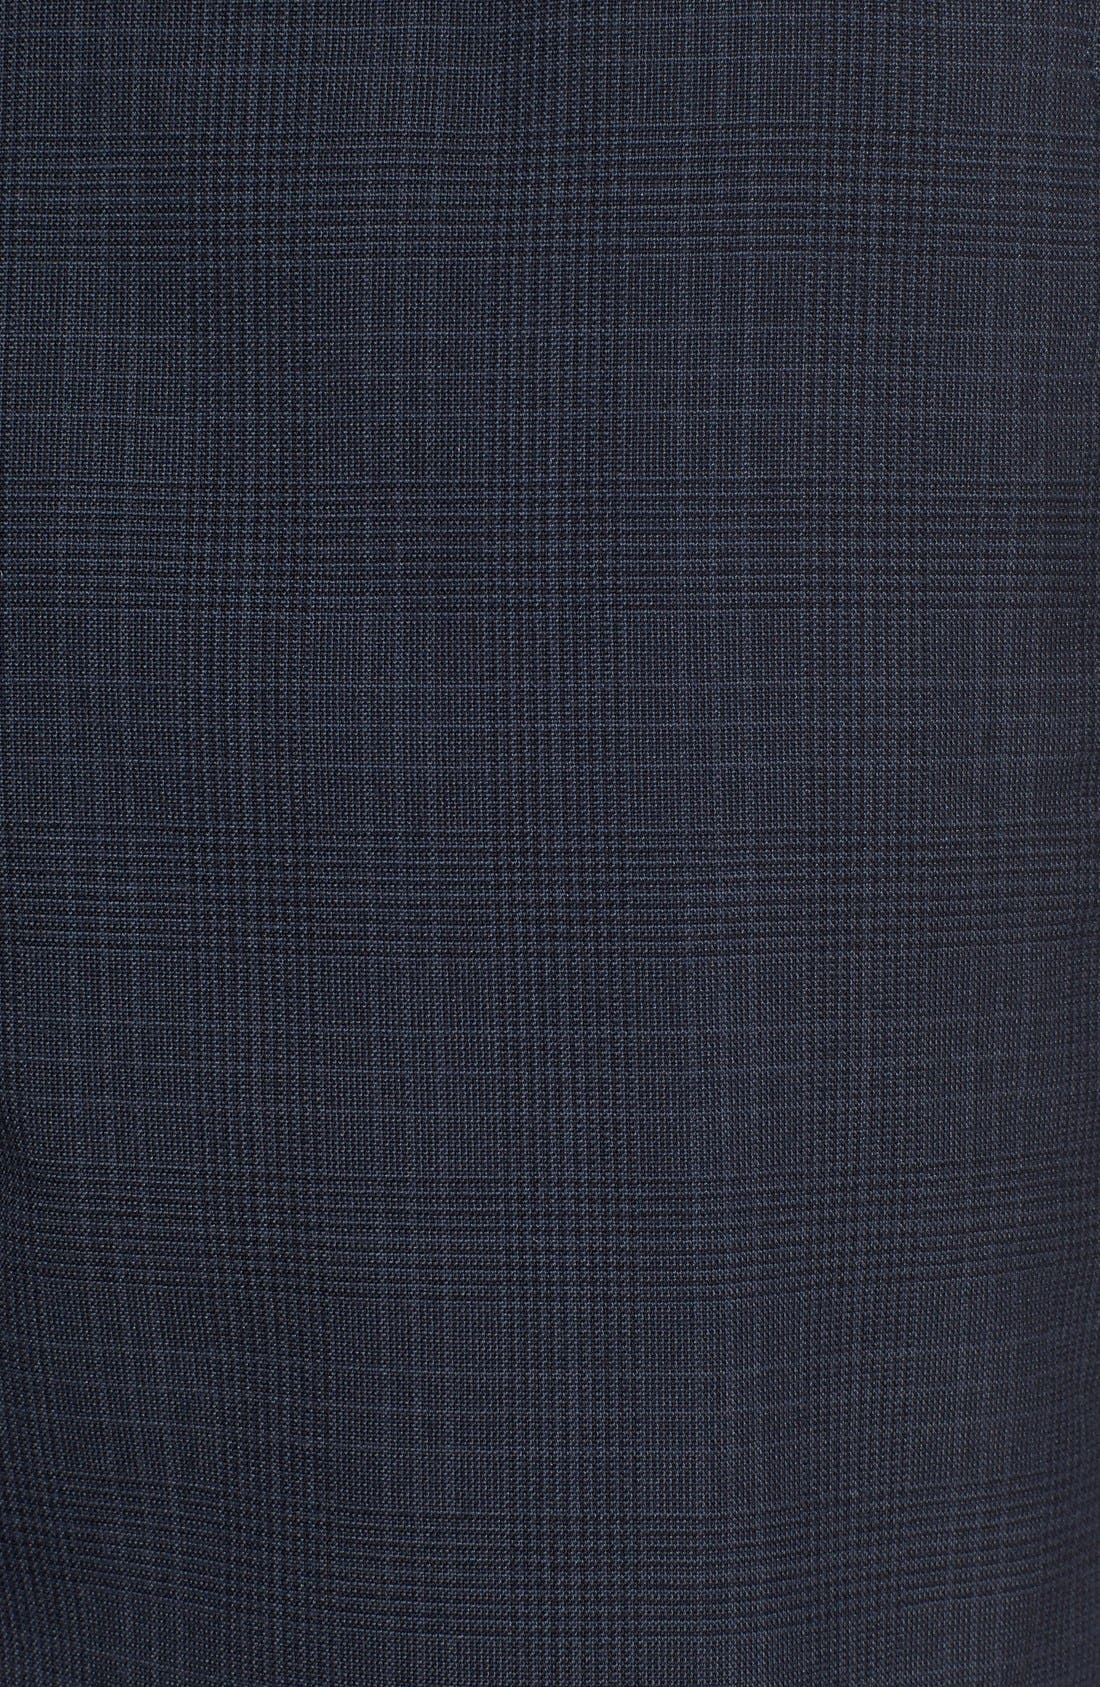 'Delta Plaid' Chino Shorts,                             Alternate thumbnail 24, color,